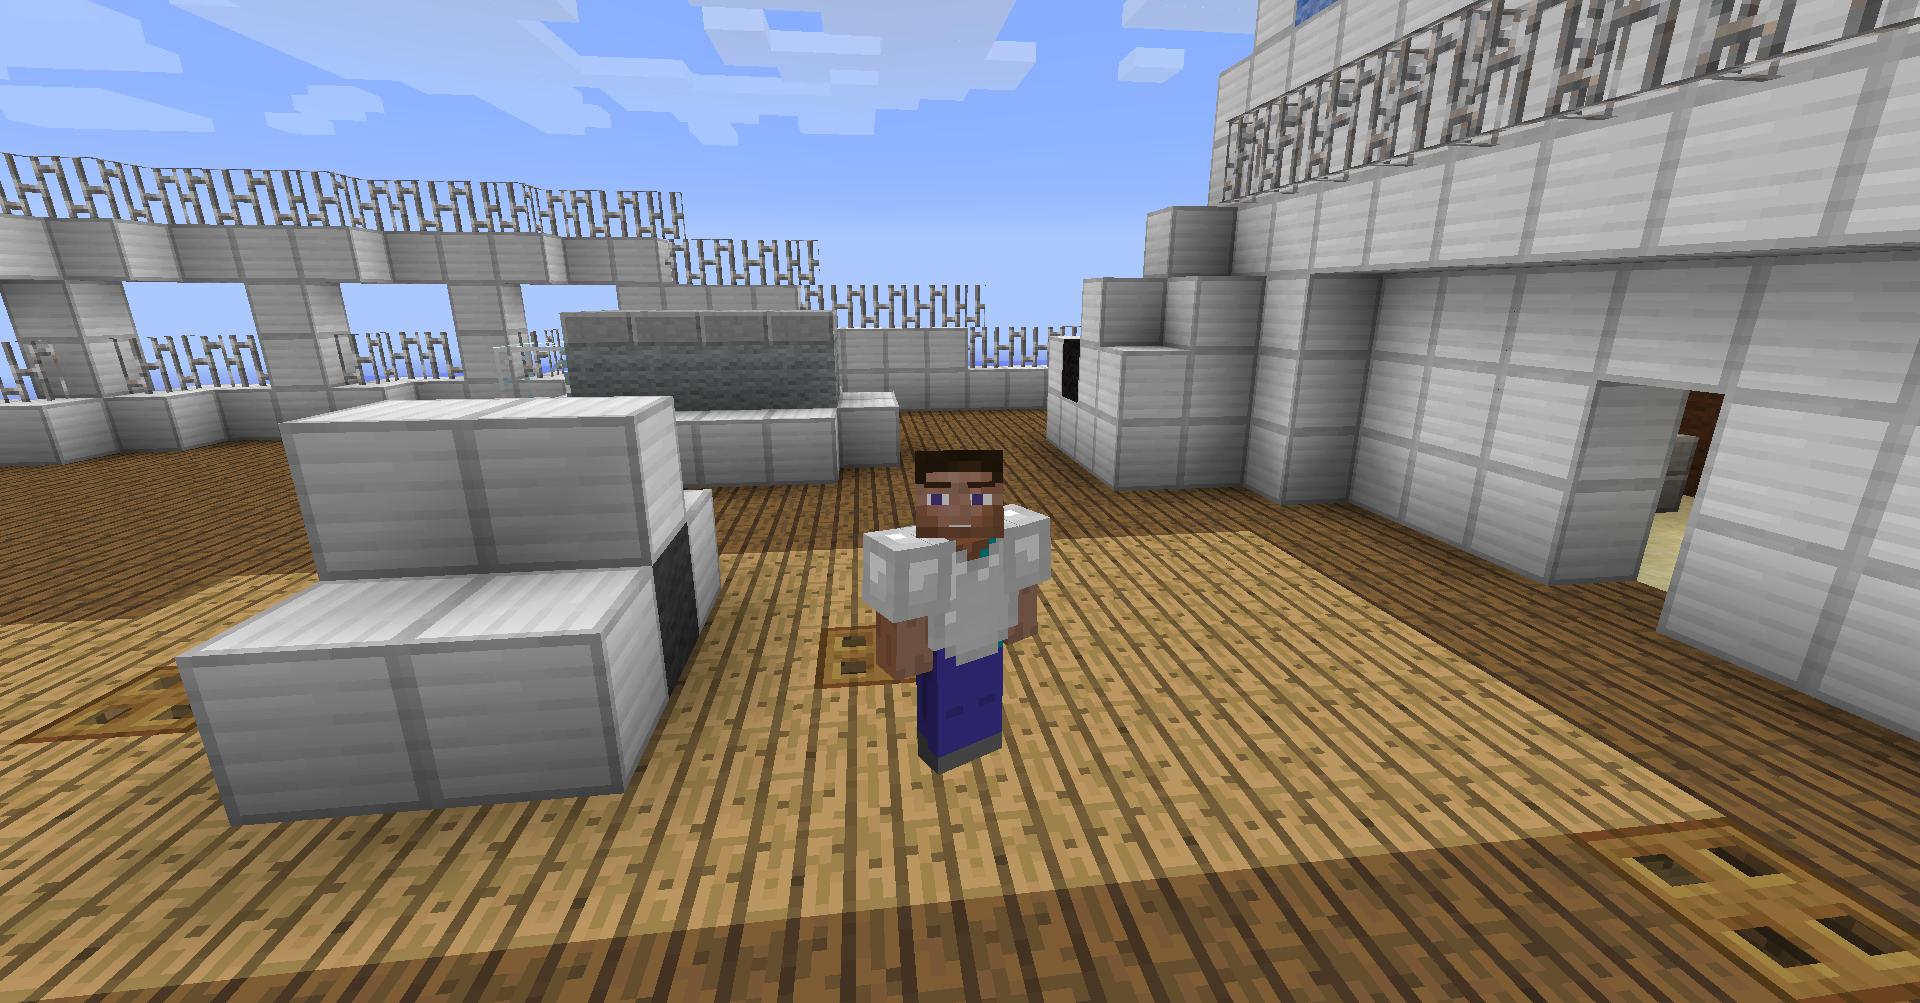 Animated Player Mod (1 7) | Minecraft Mods